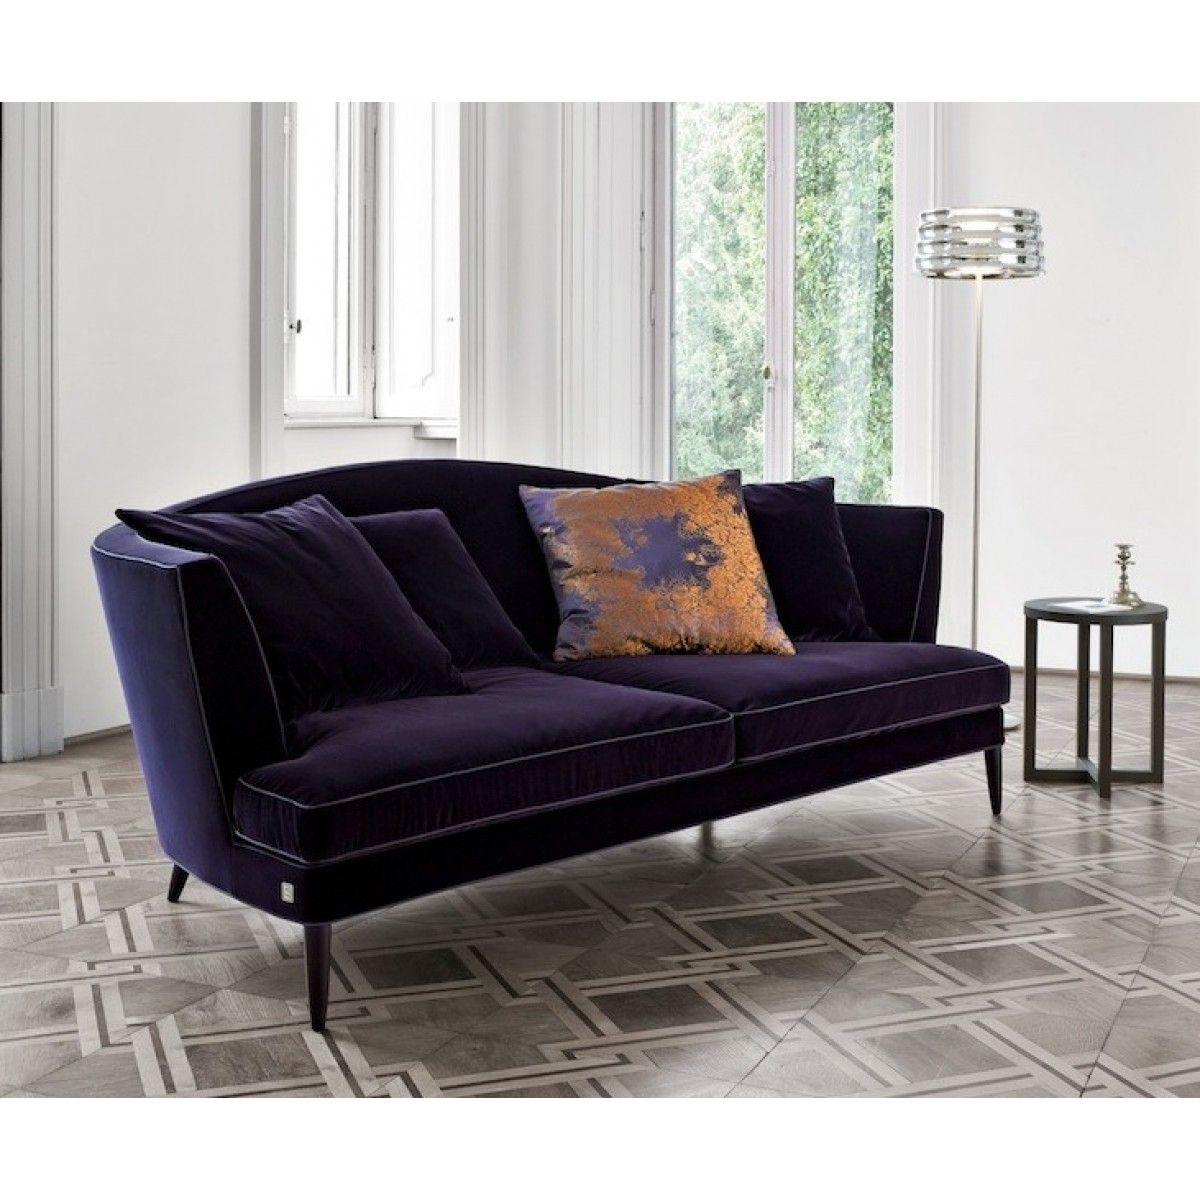 Busnelli Tresor Sofa Furniture Italian Furniture Stores Luxury Italian Furniture